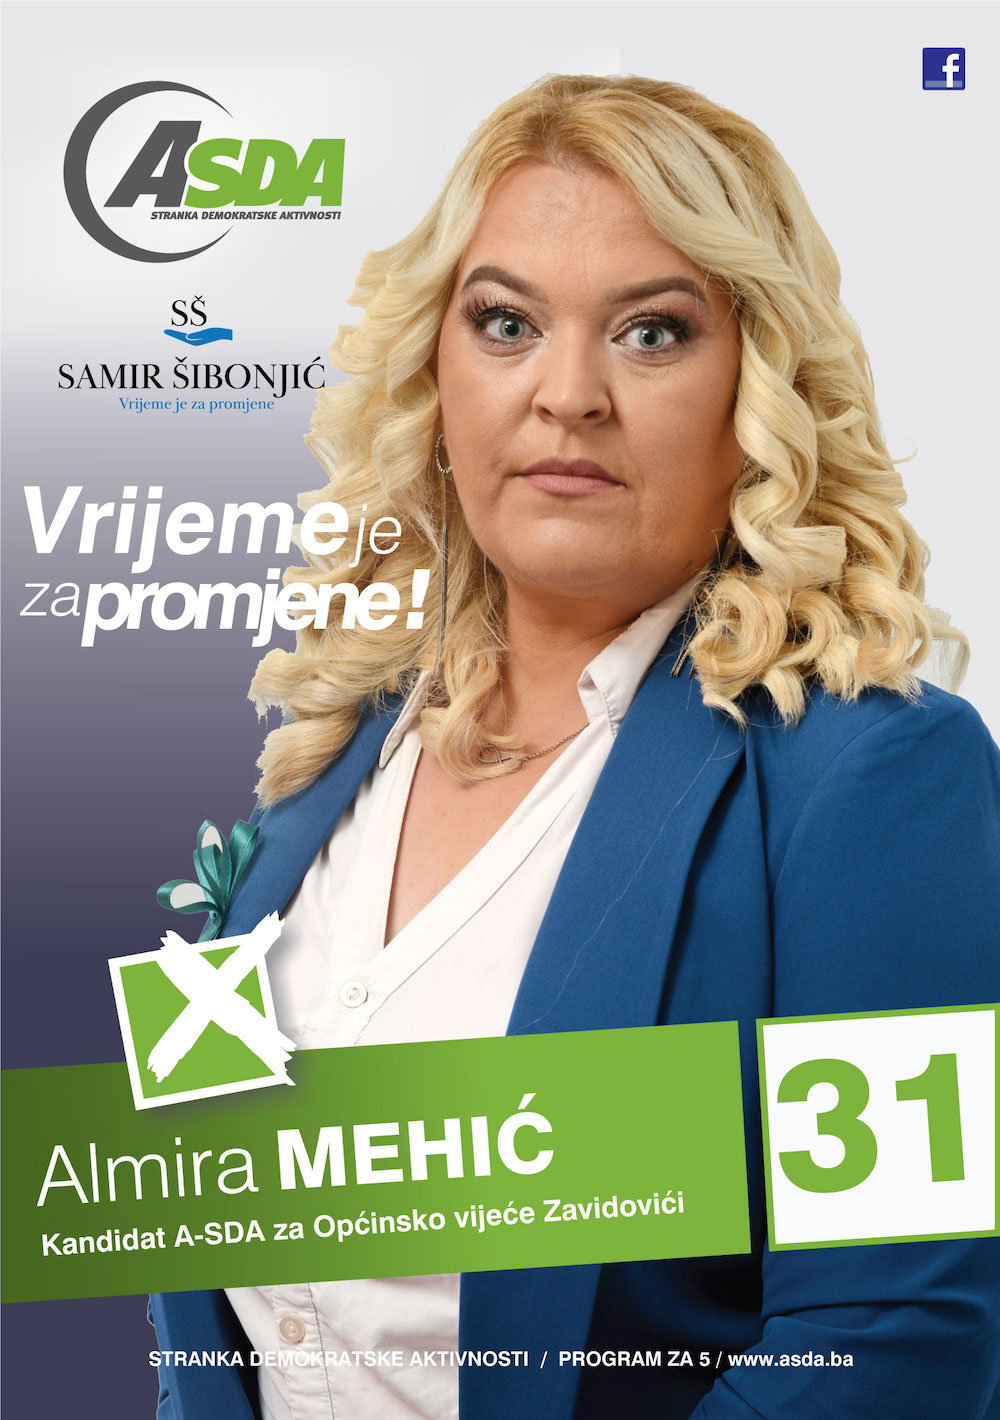 Almira Mehić